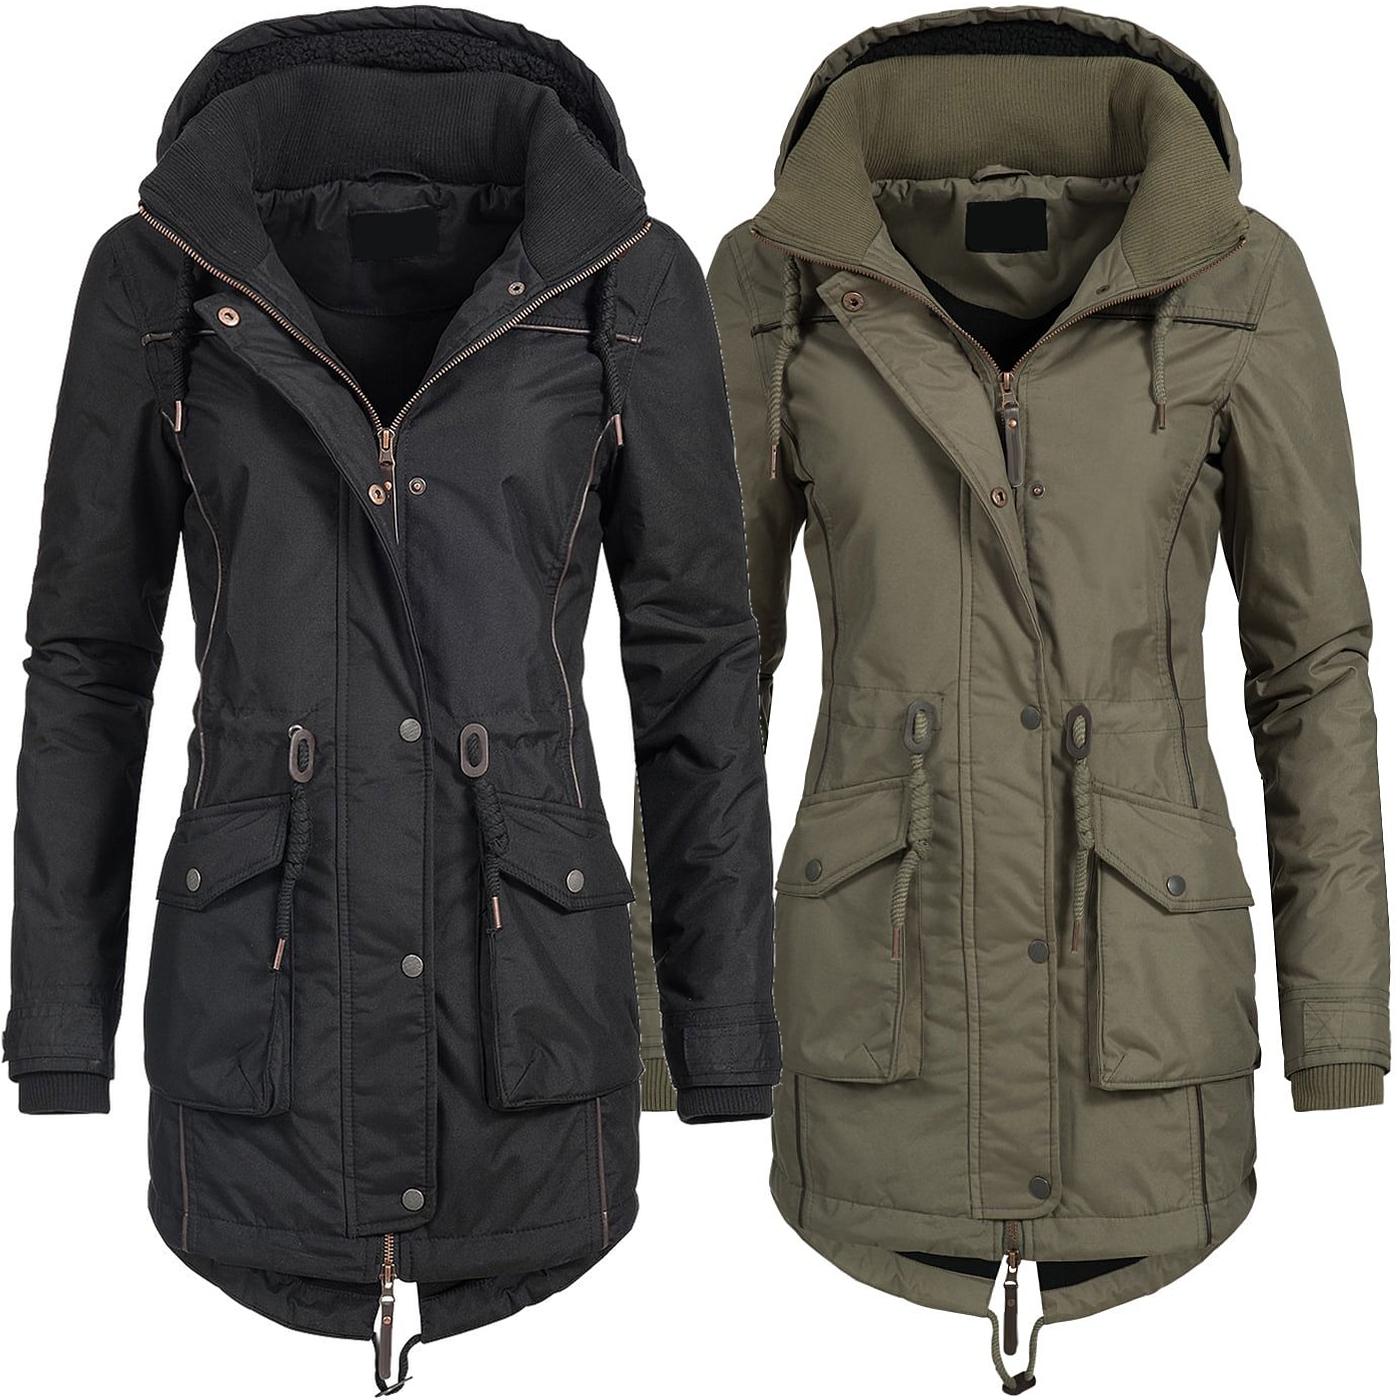 741d46d6e34f Azuonda Damen Mantel Winterjacke Parka Wintermantel warm Teddyfell Jacke  Az97 XS-XXL 2-Farben